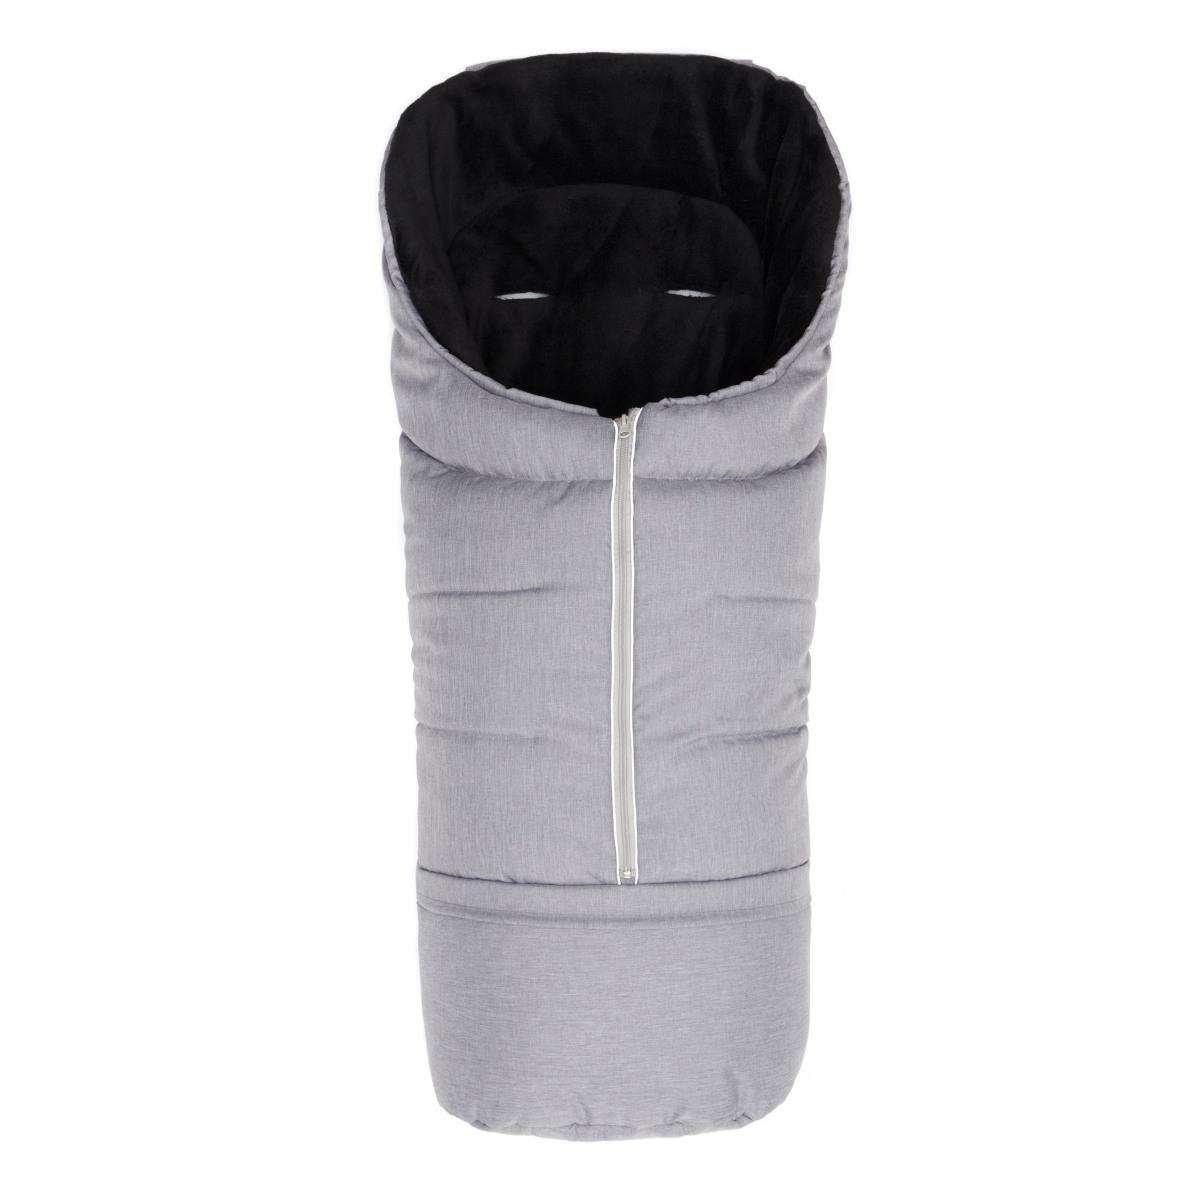 Fillikid Sleeping Bag Mellange Grey Bērnu ziemas siltais guļammaiss 100x45 cm